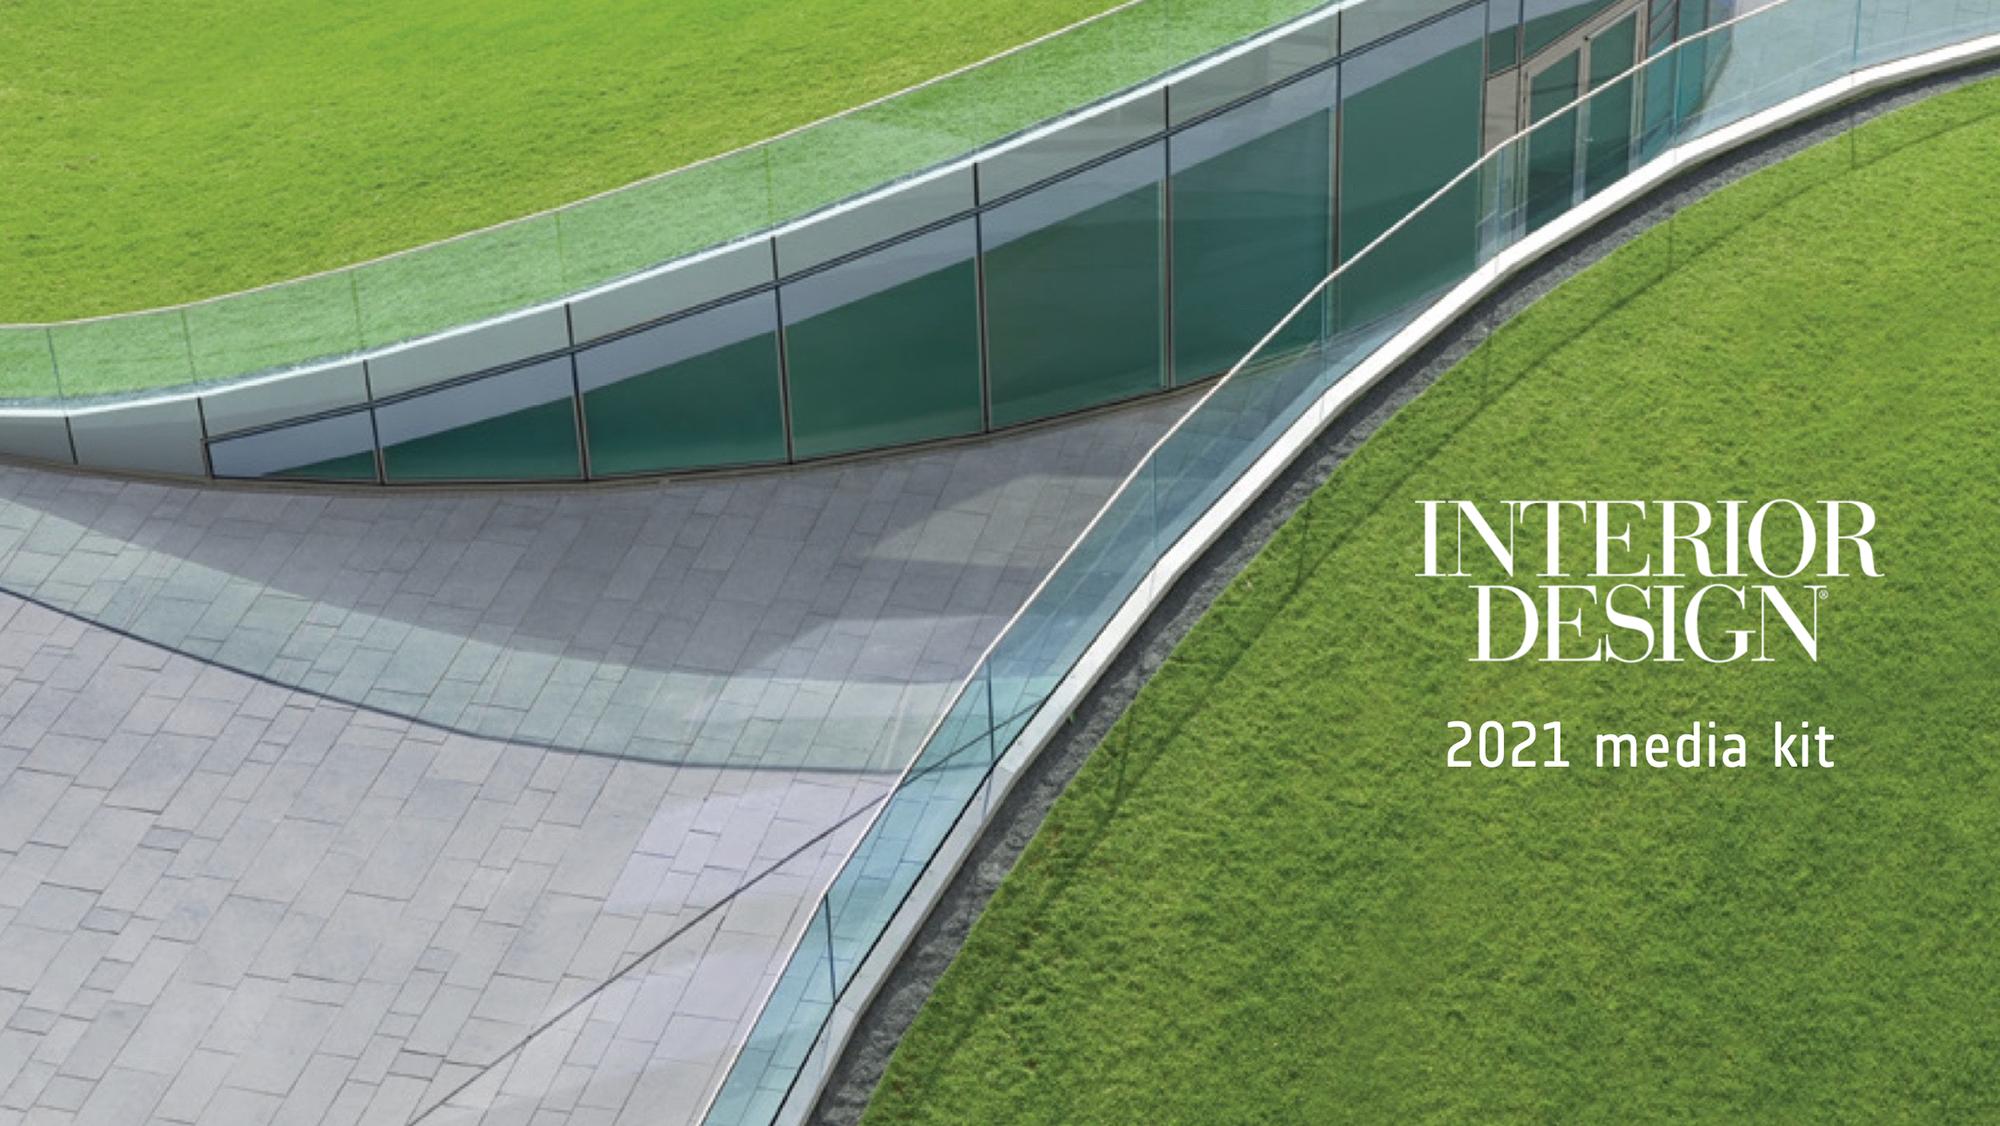 Interior Design 2021 Media Kit